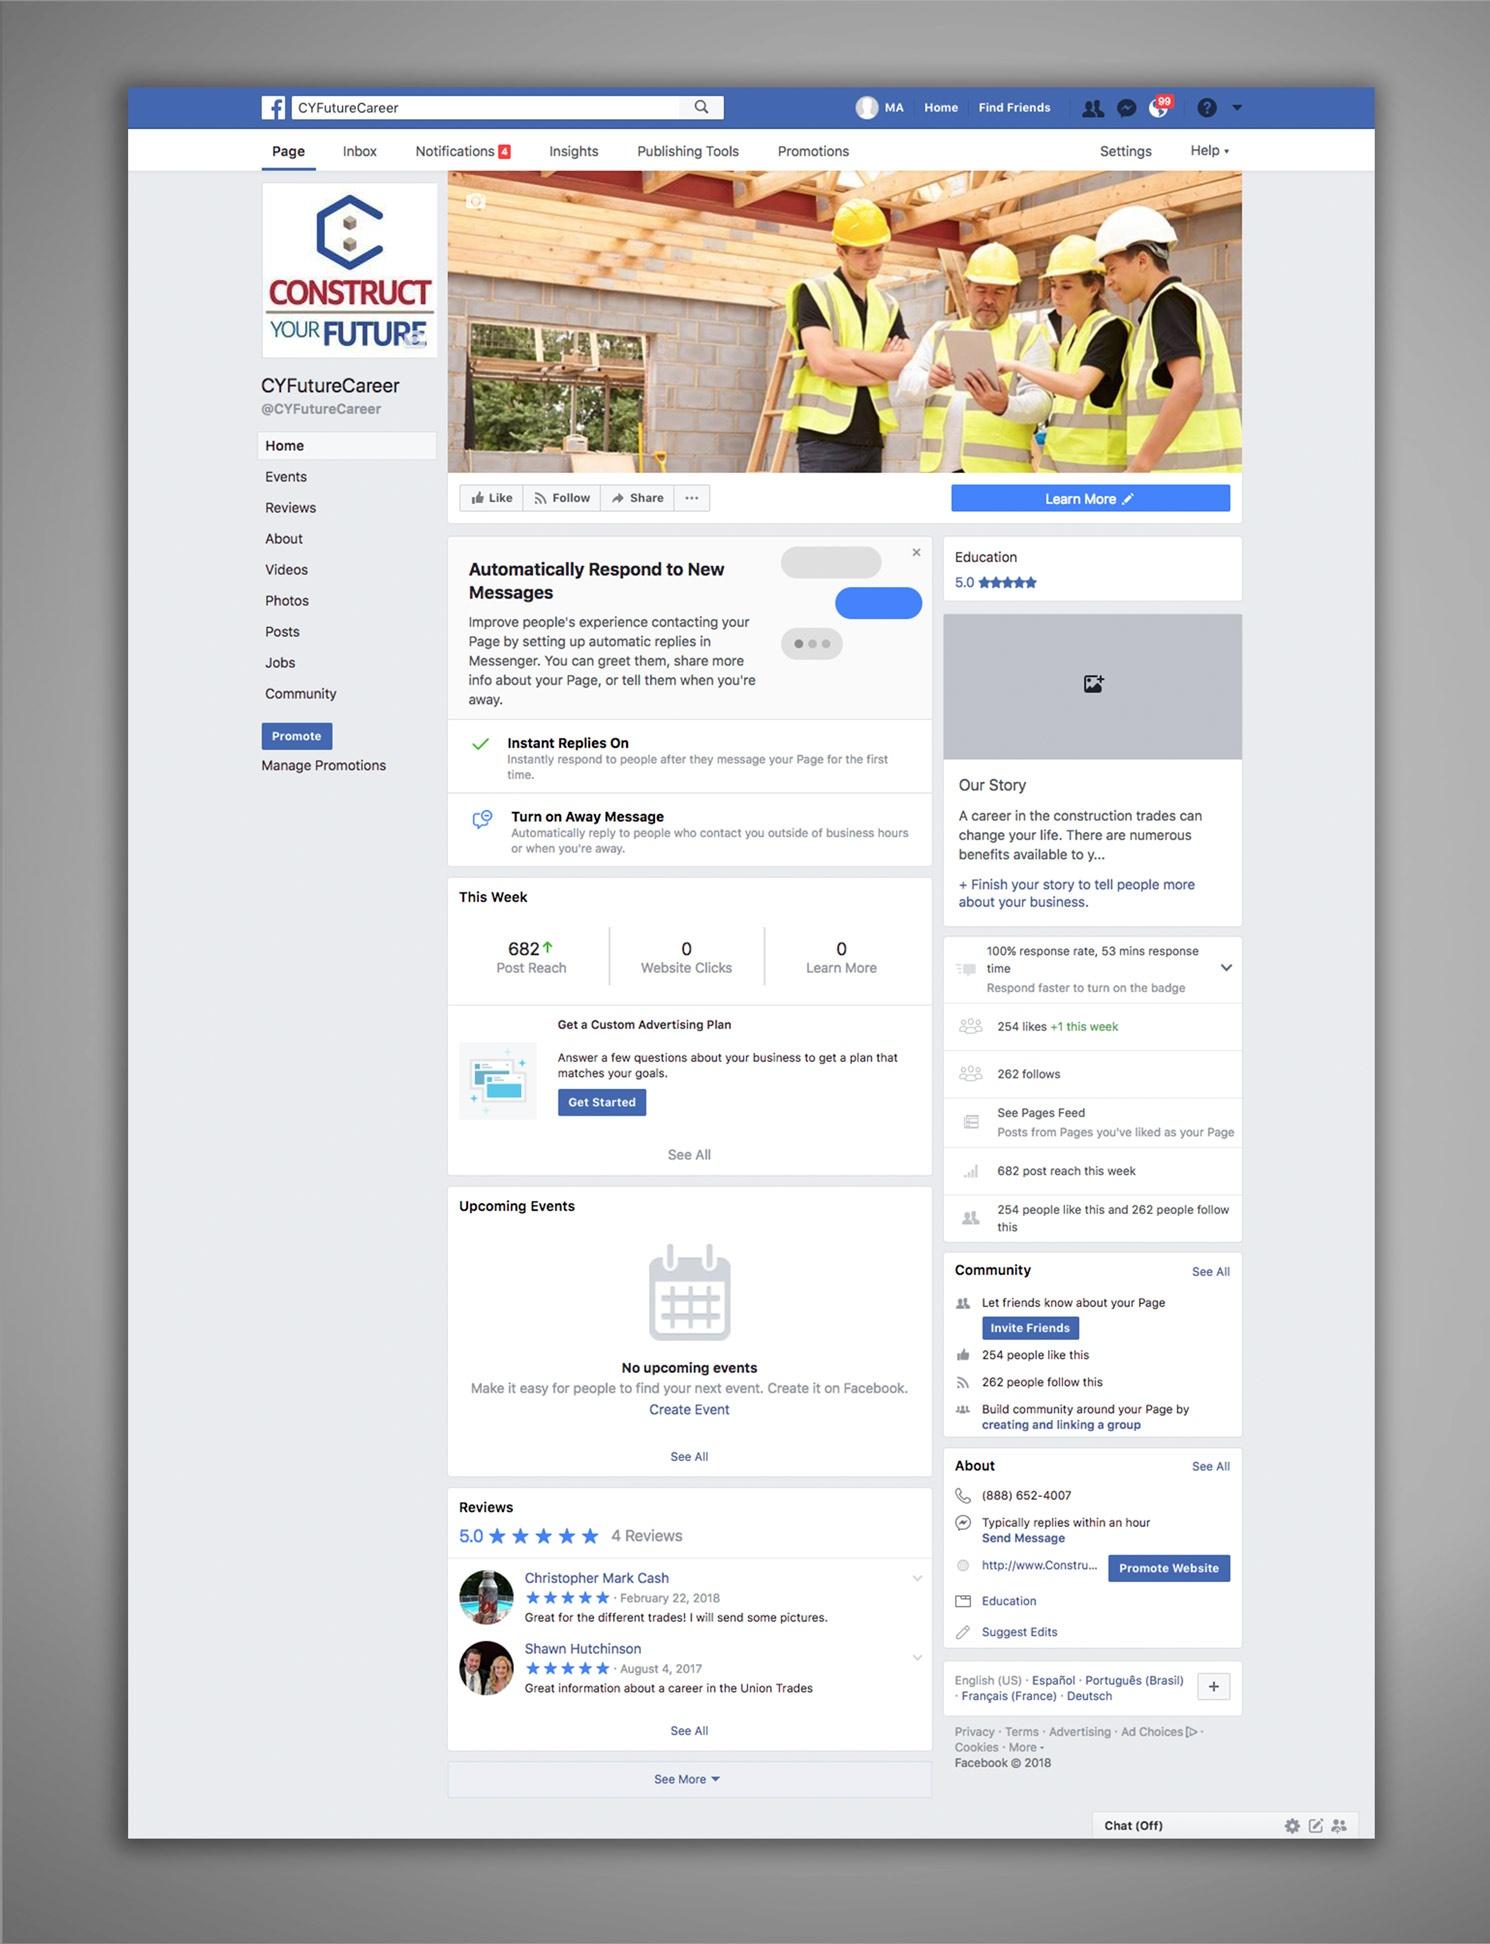 Construct Your Future Facebook Management